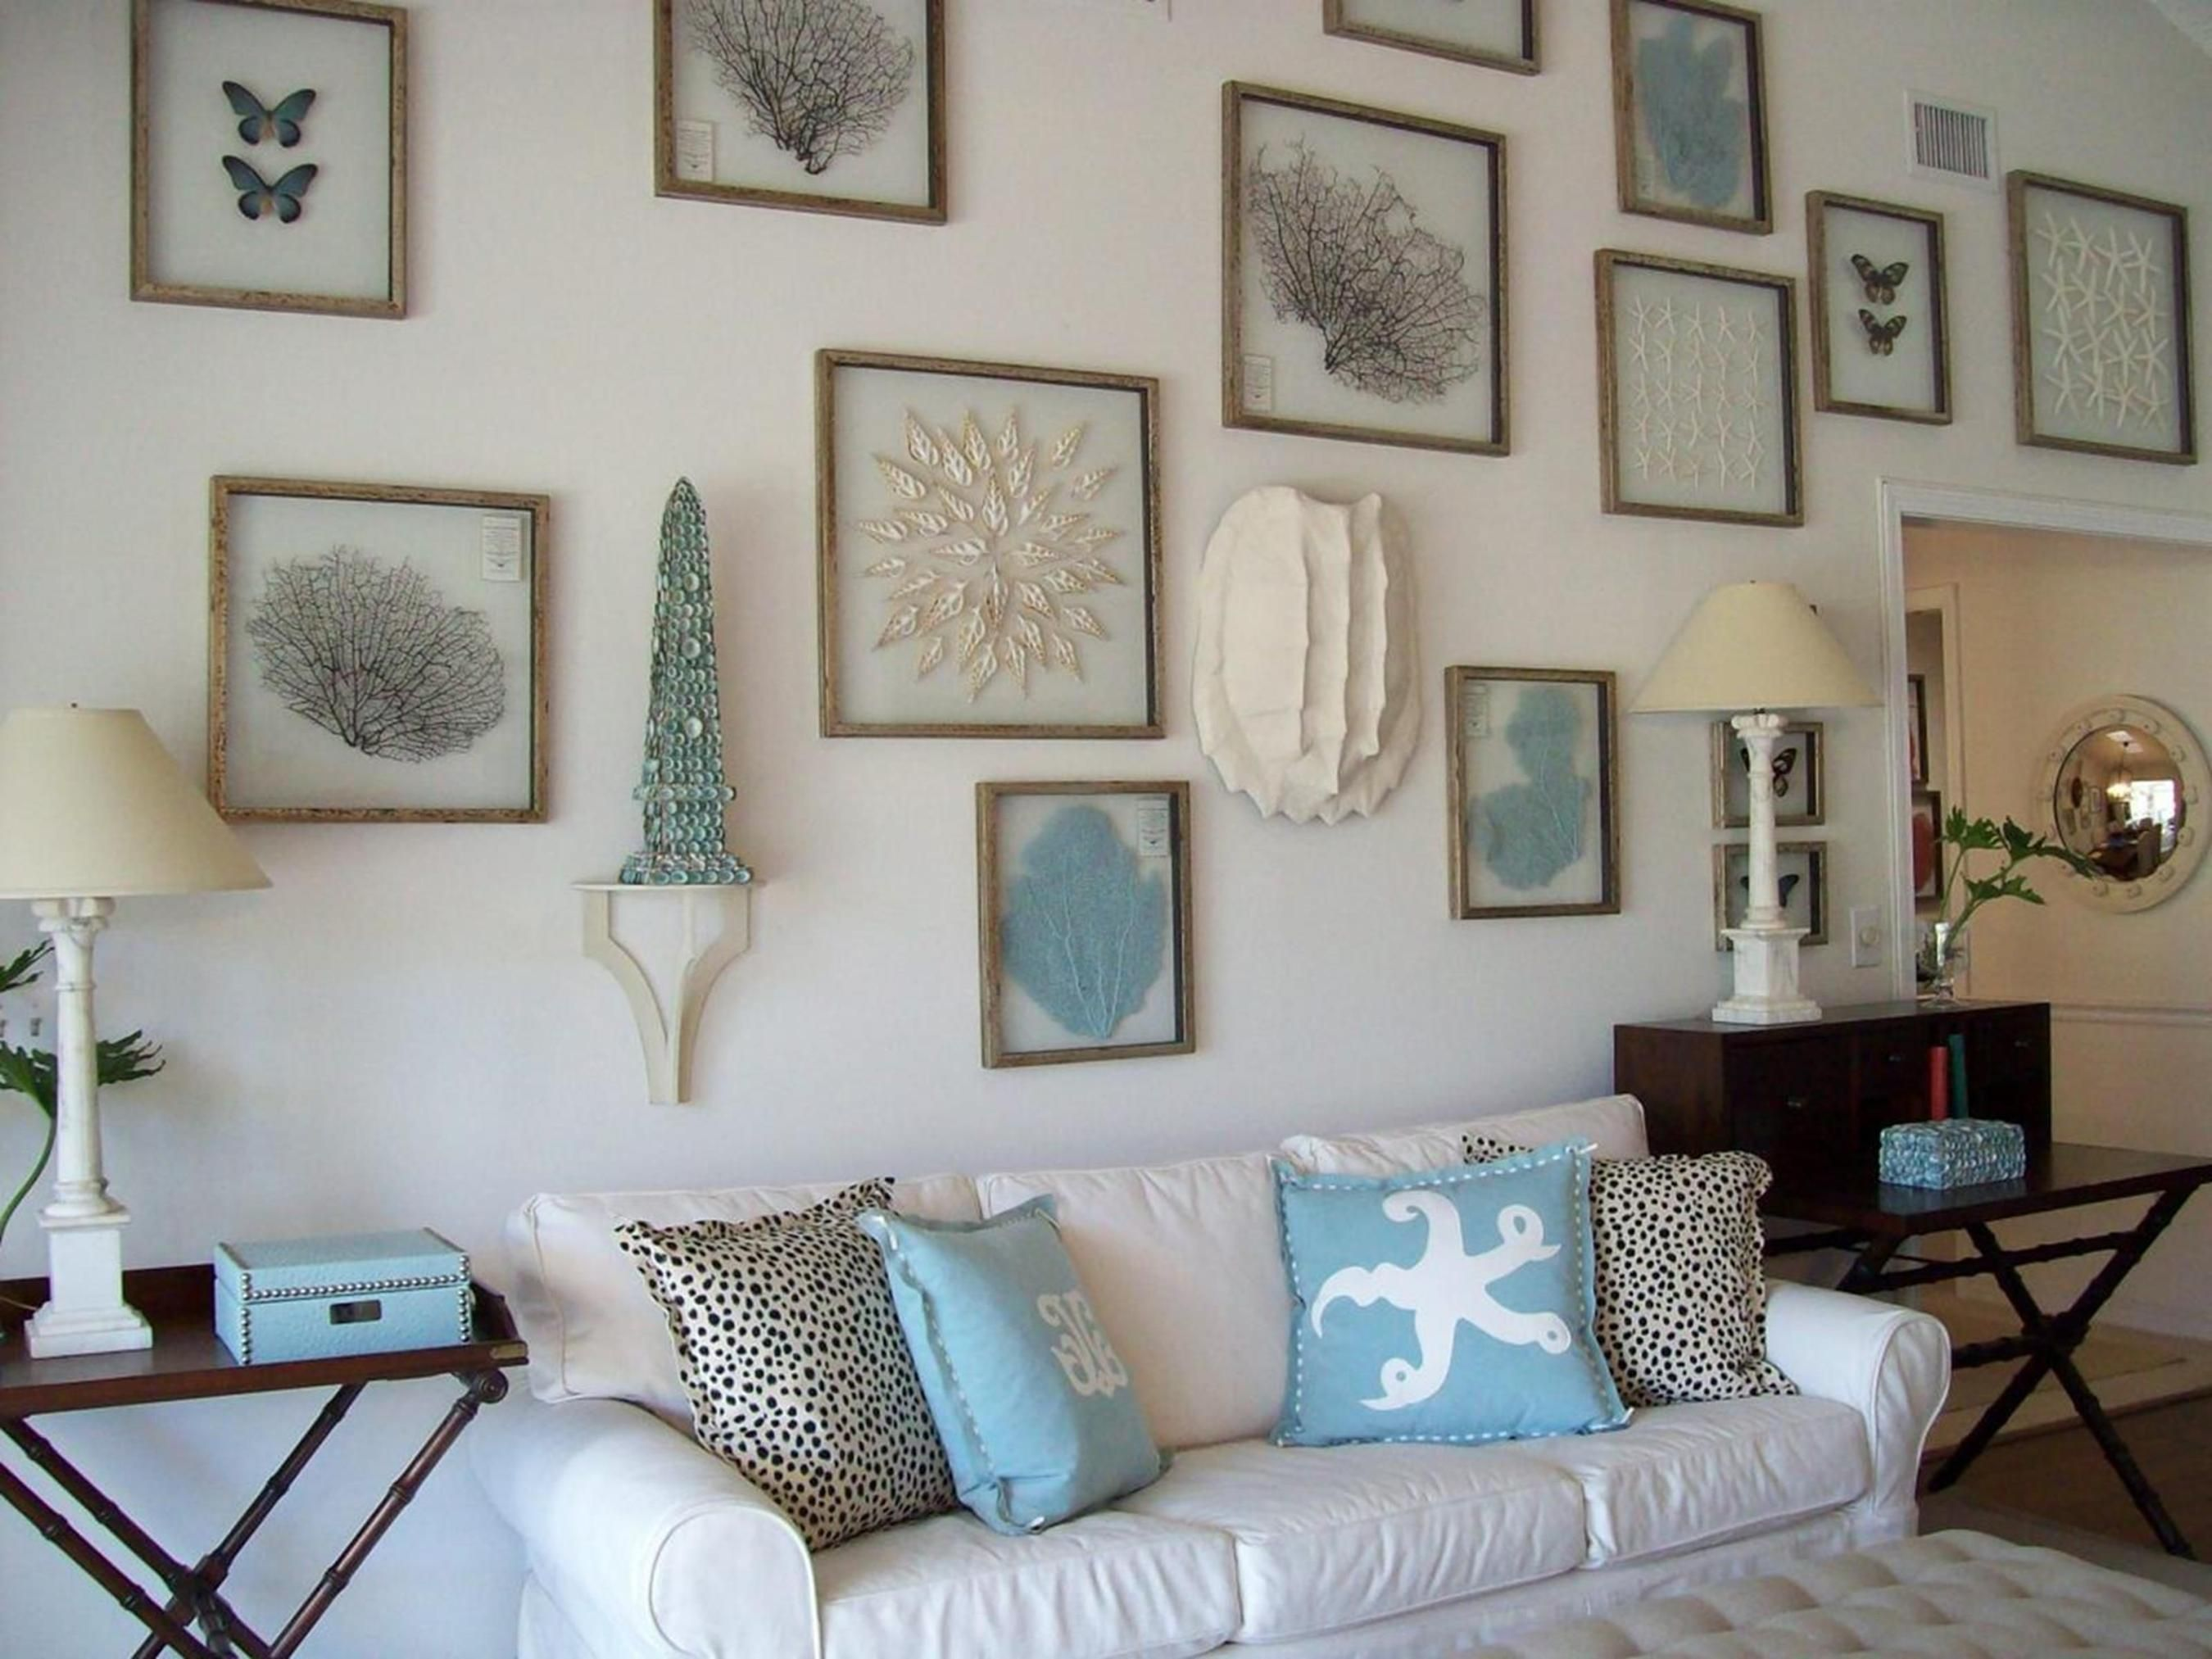 32 Amazing Coastal Living Room Decorating Ideas On A Budget